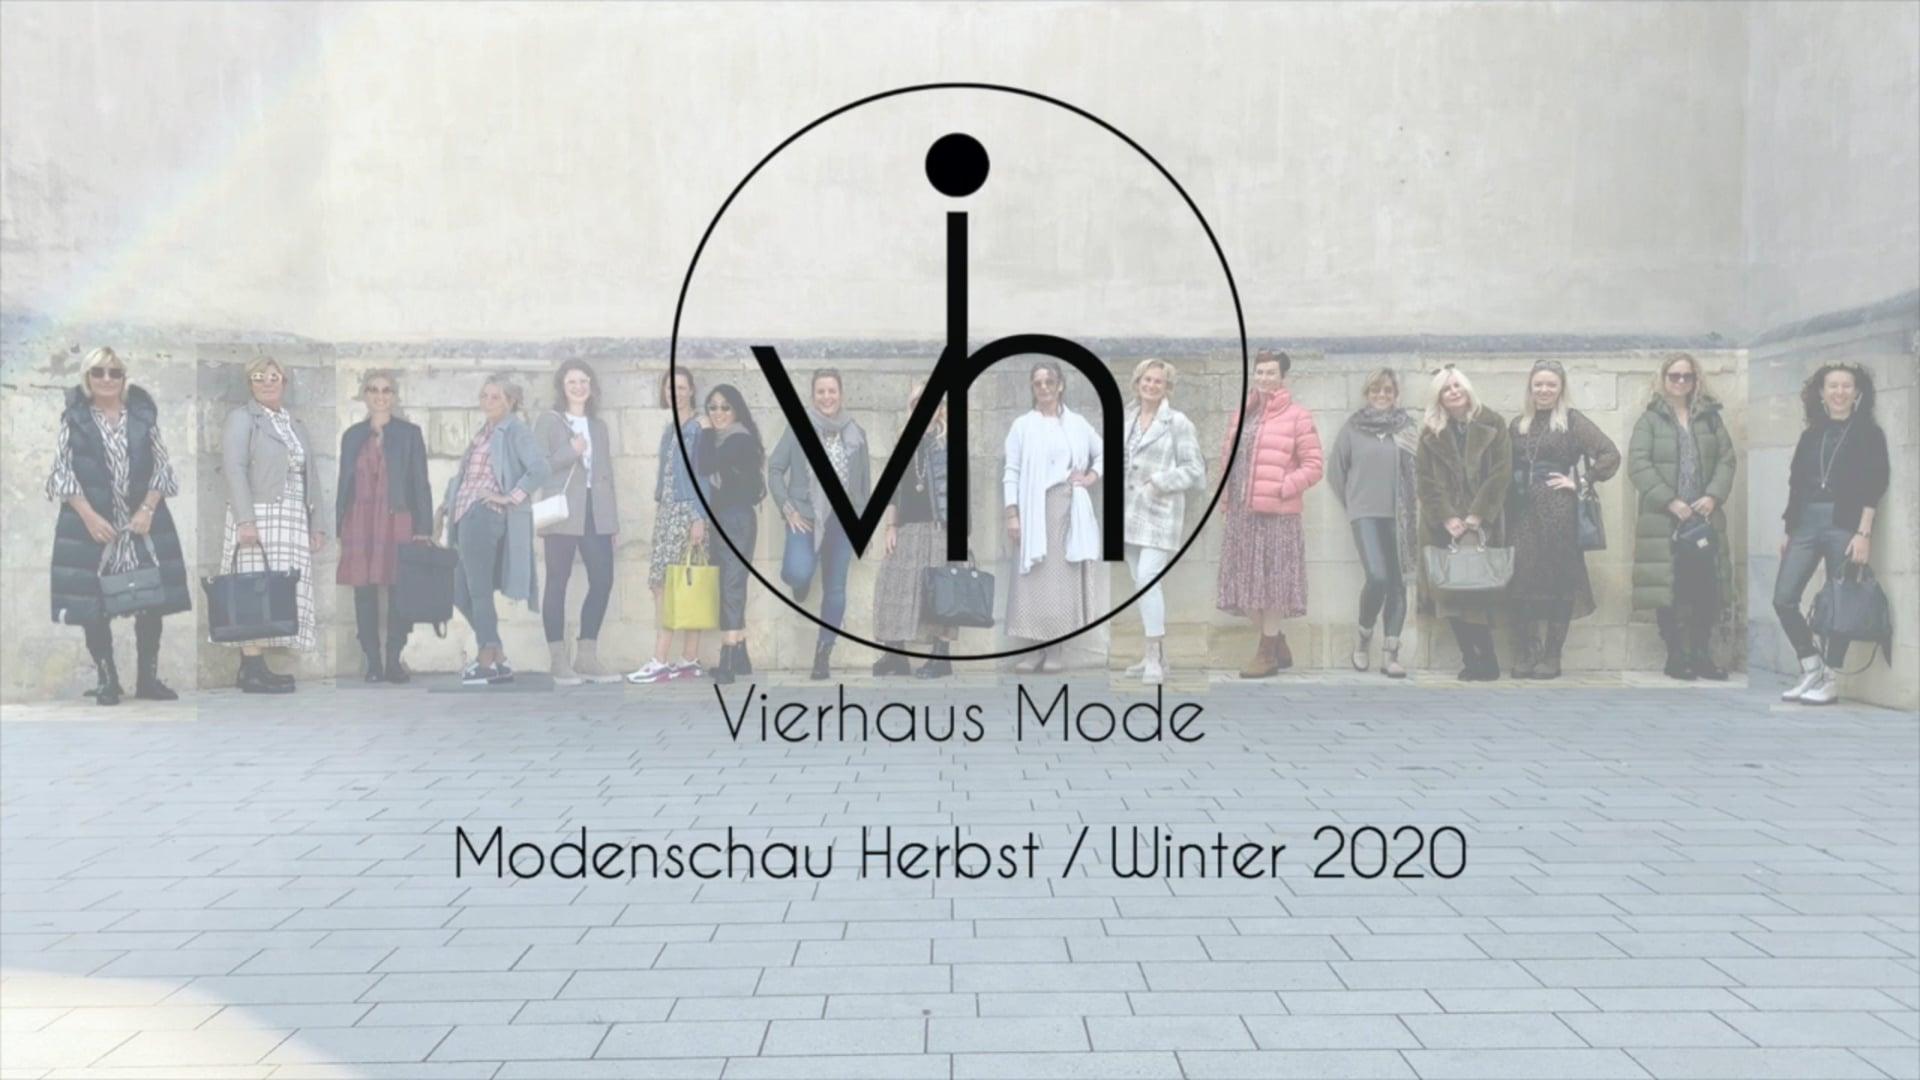 Vierhaus Mode - Modenschau Herbst / Winter 2020